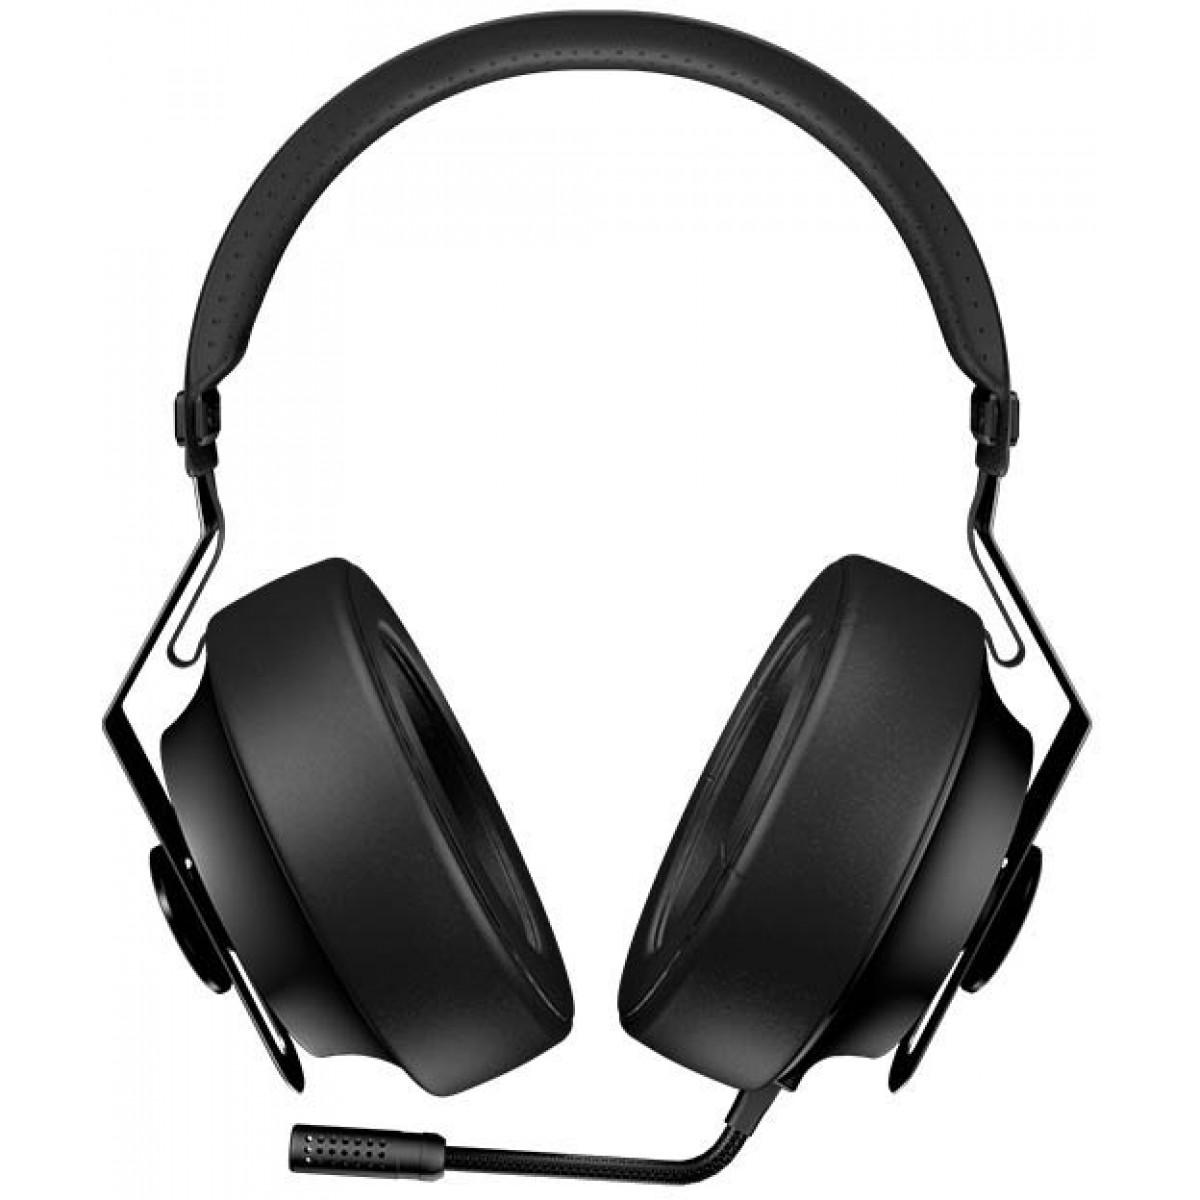 Headset Gamer Cougar Phontum Essential, Black, 3H150P40B.0001